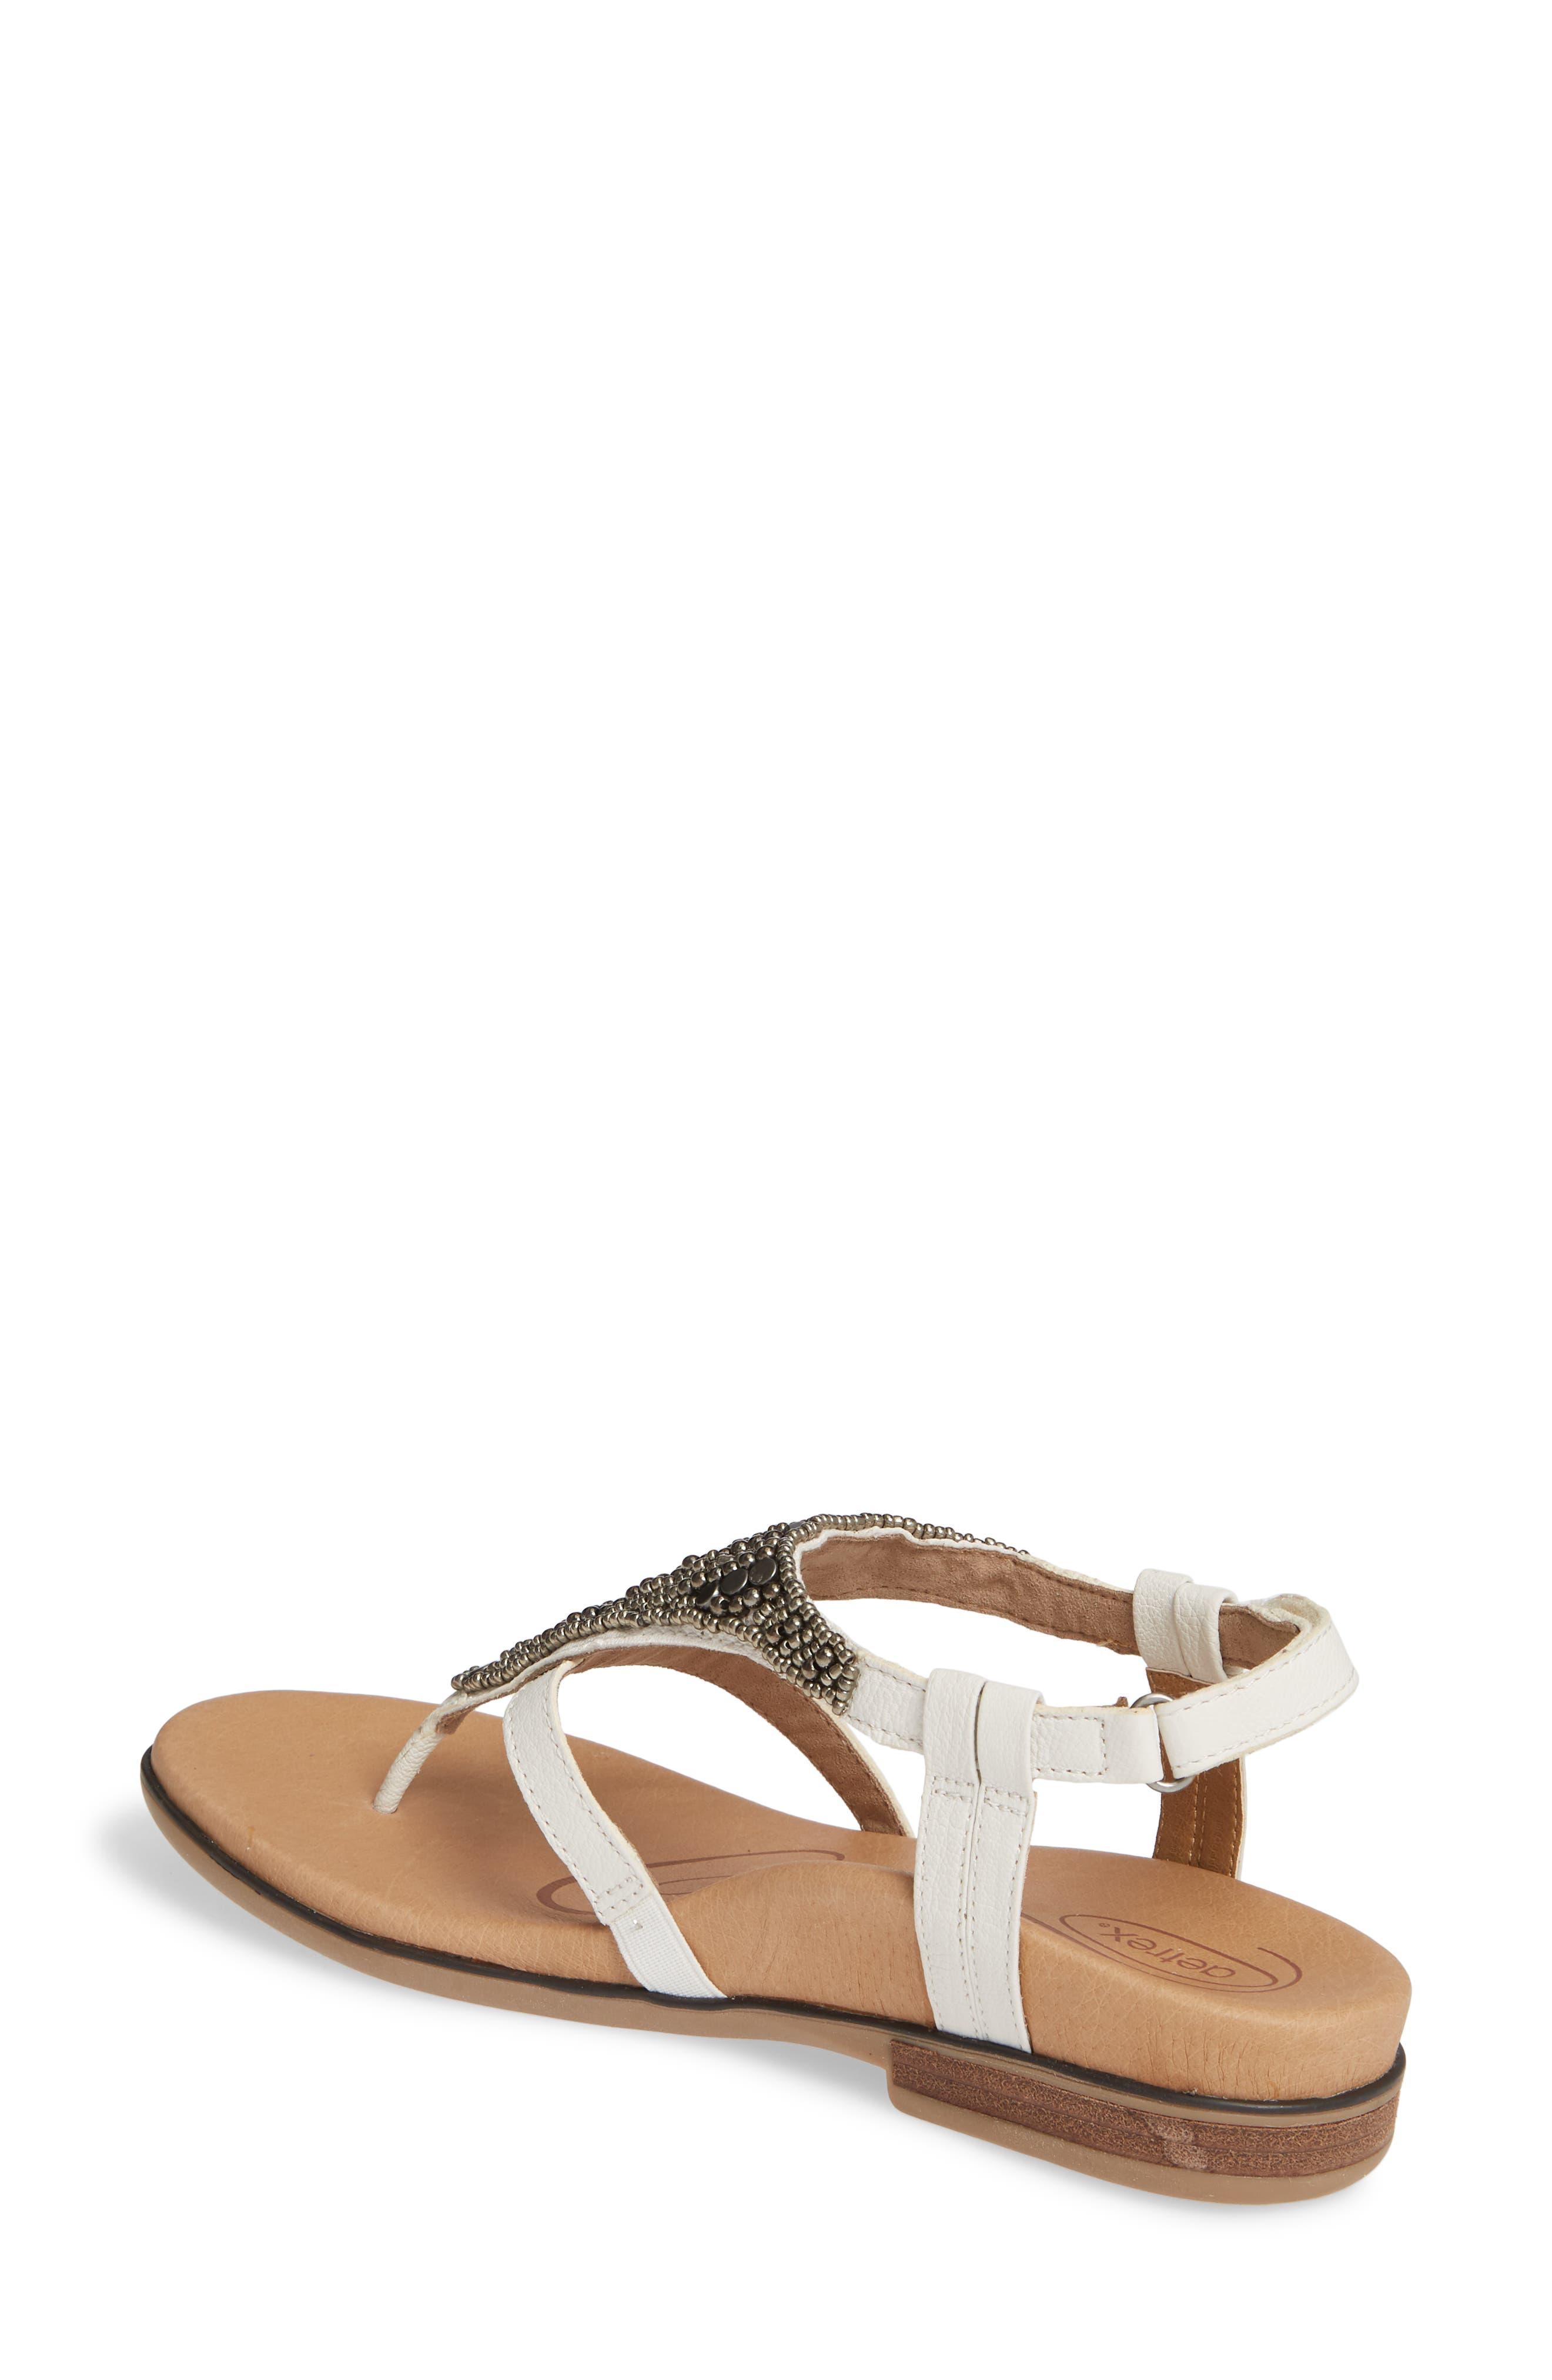 AETREX, Sheila Embellished Sandal, Alternate thumbnail 2, color, WHITE LEATHER